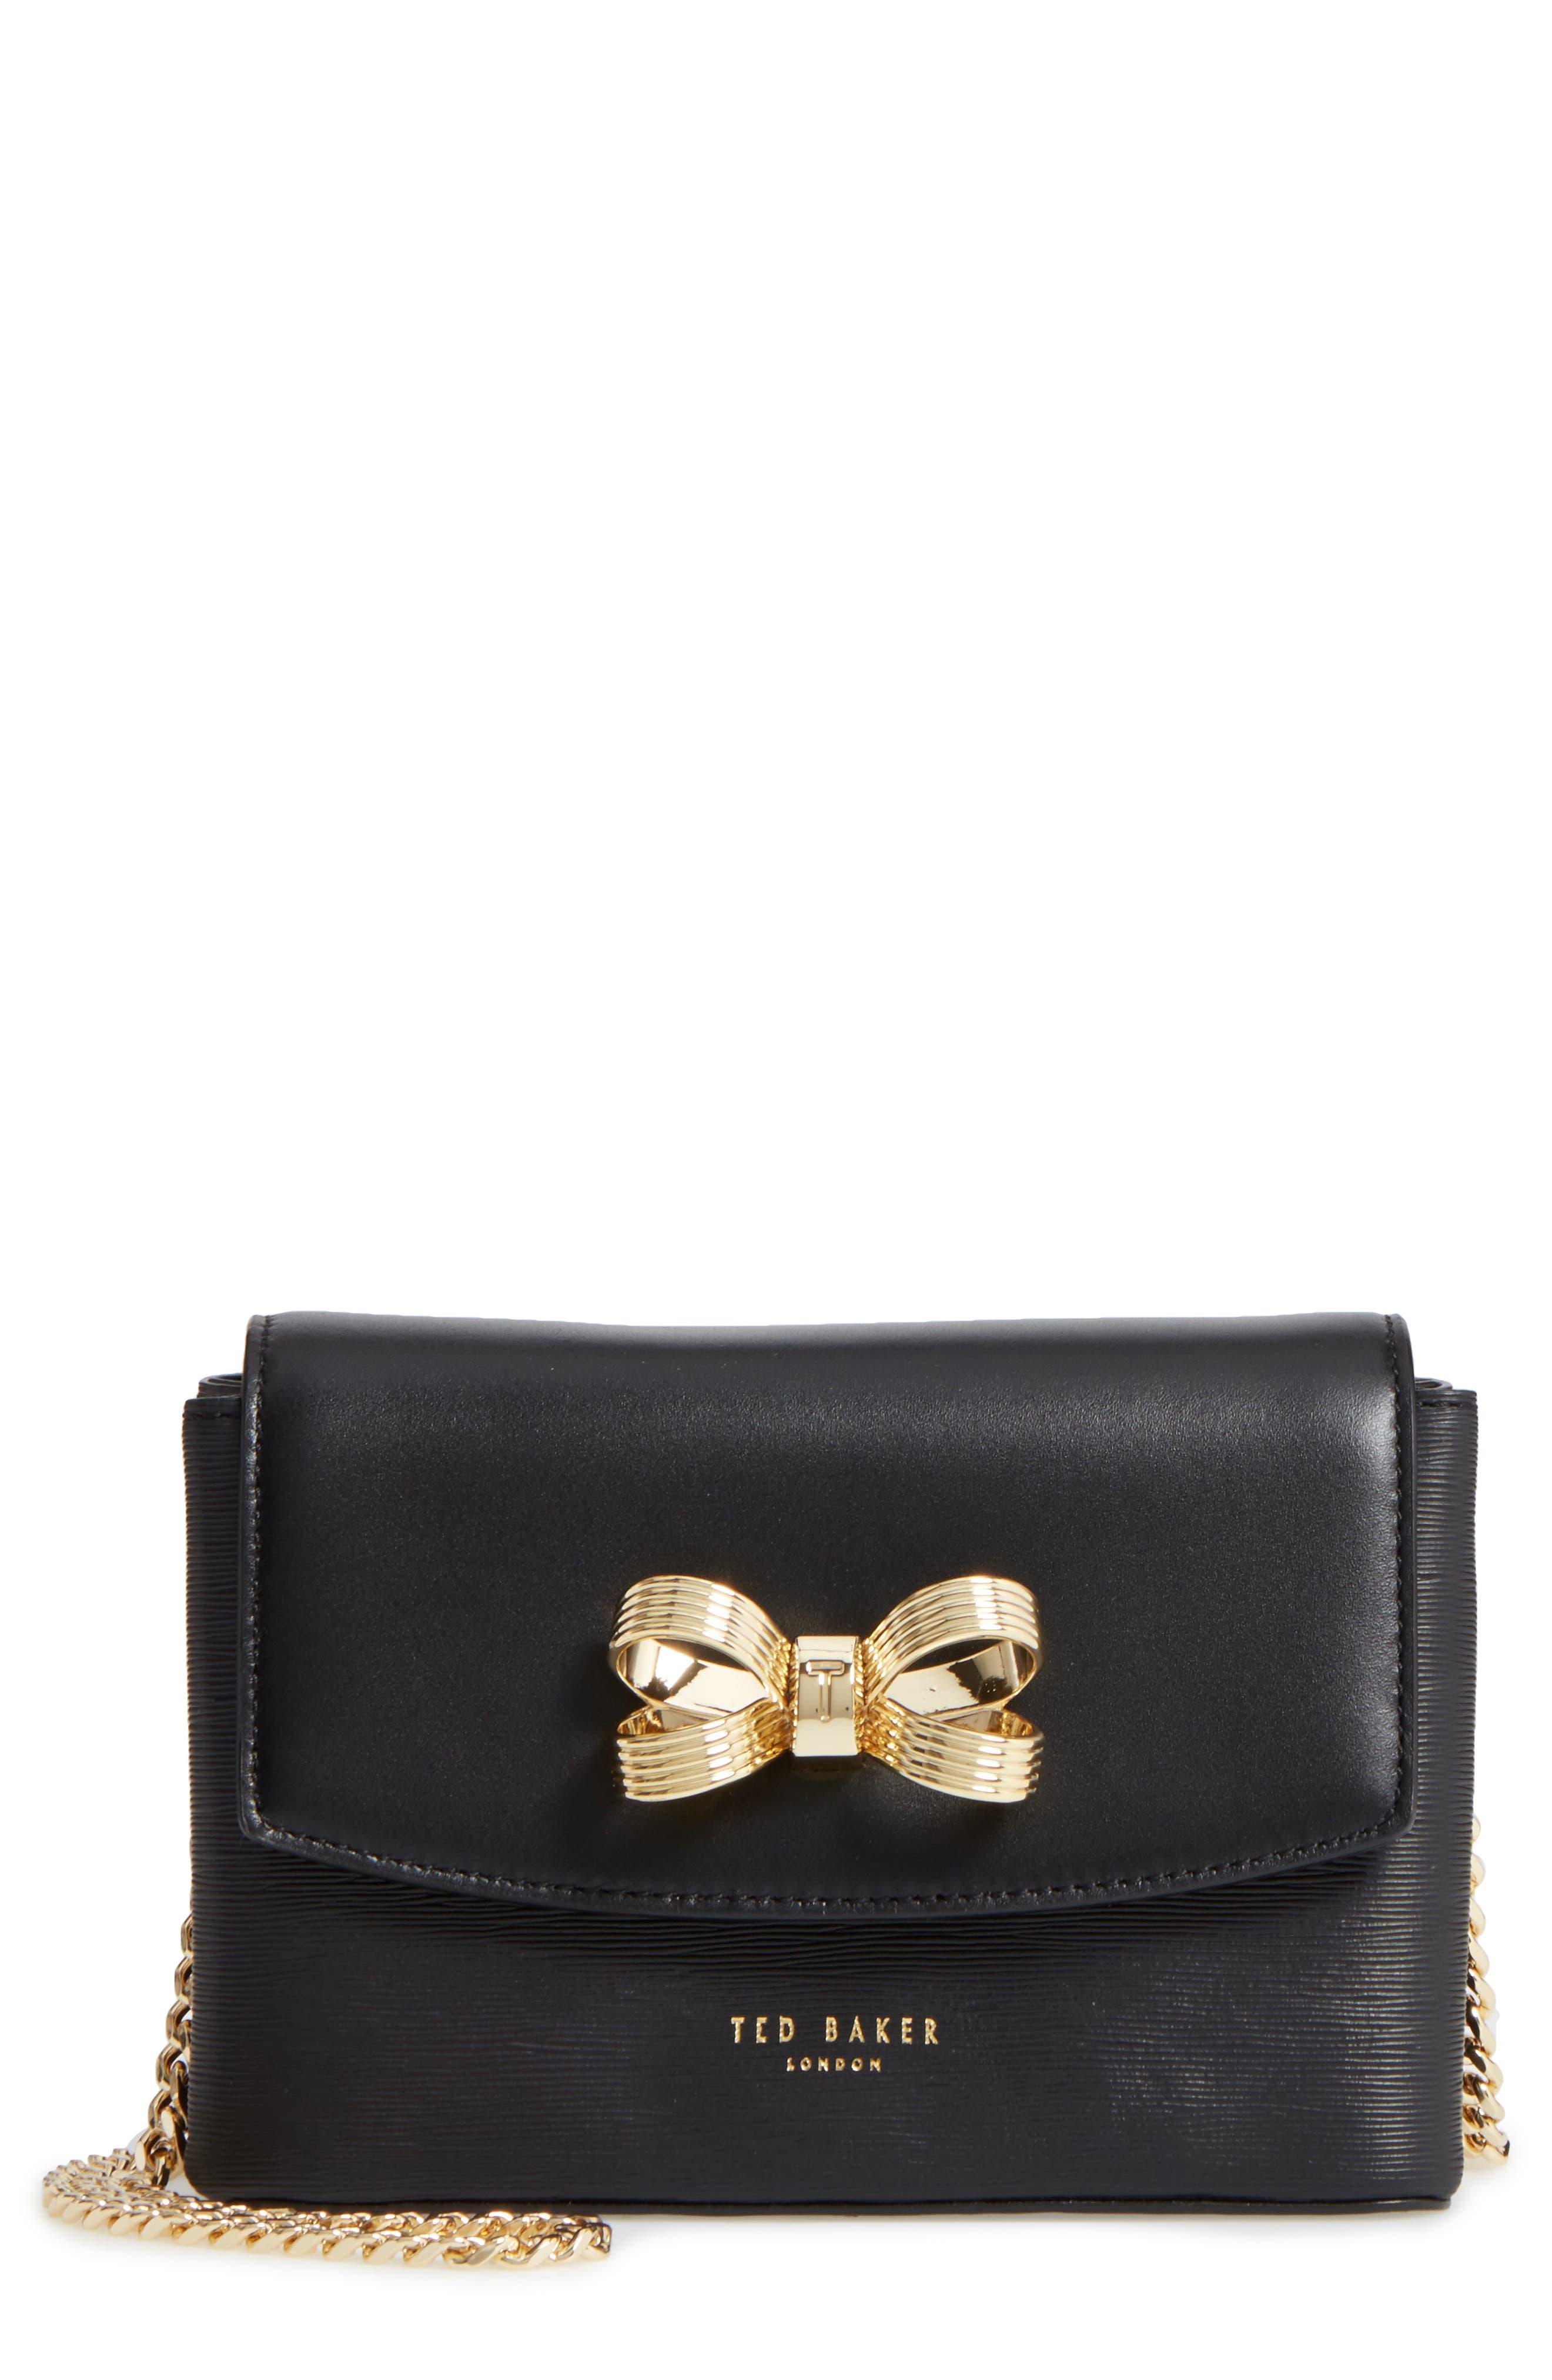 Leorr Bow Leather Crossbody Bag,                             Main thumbnail 1, color,                             001